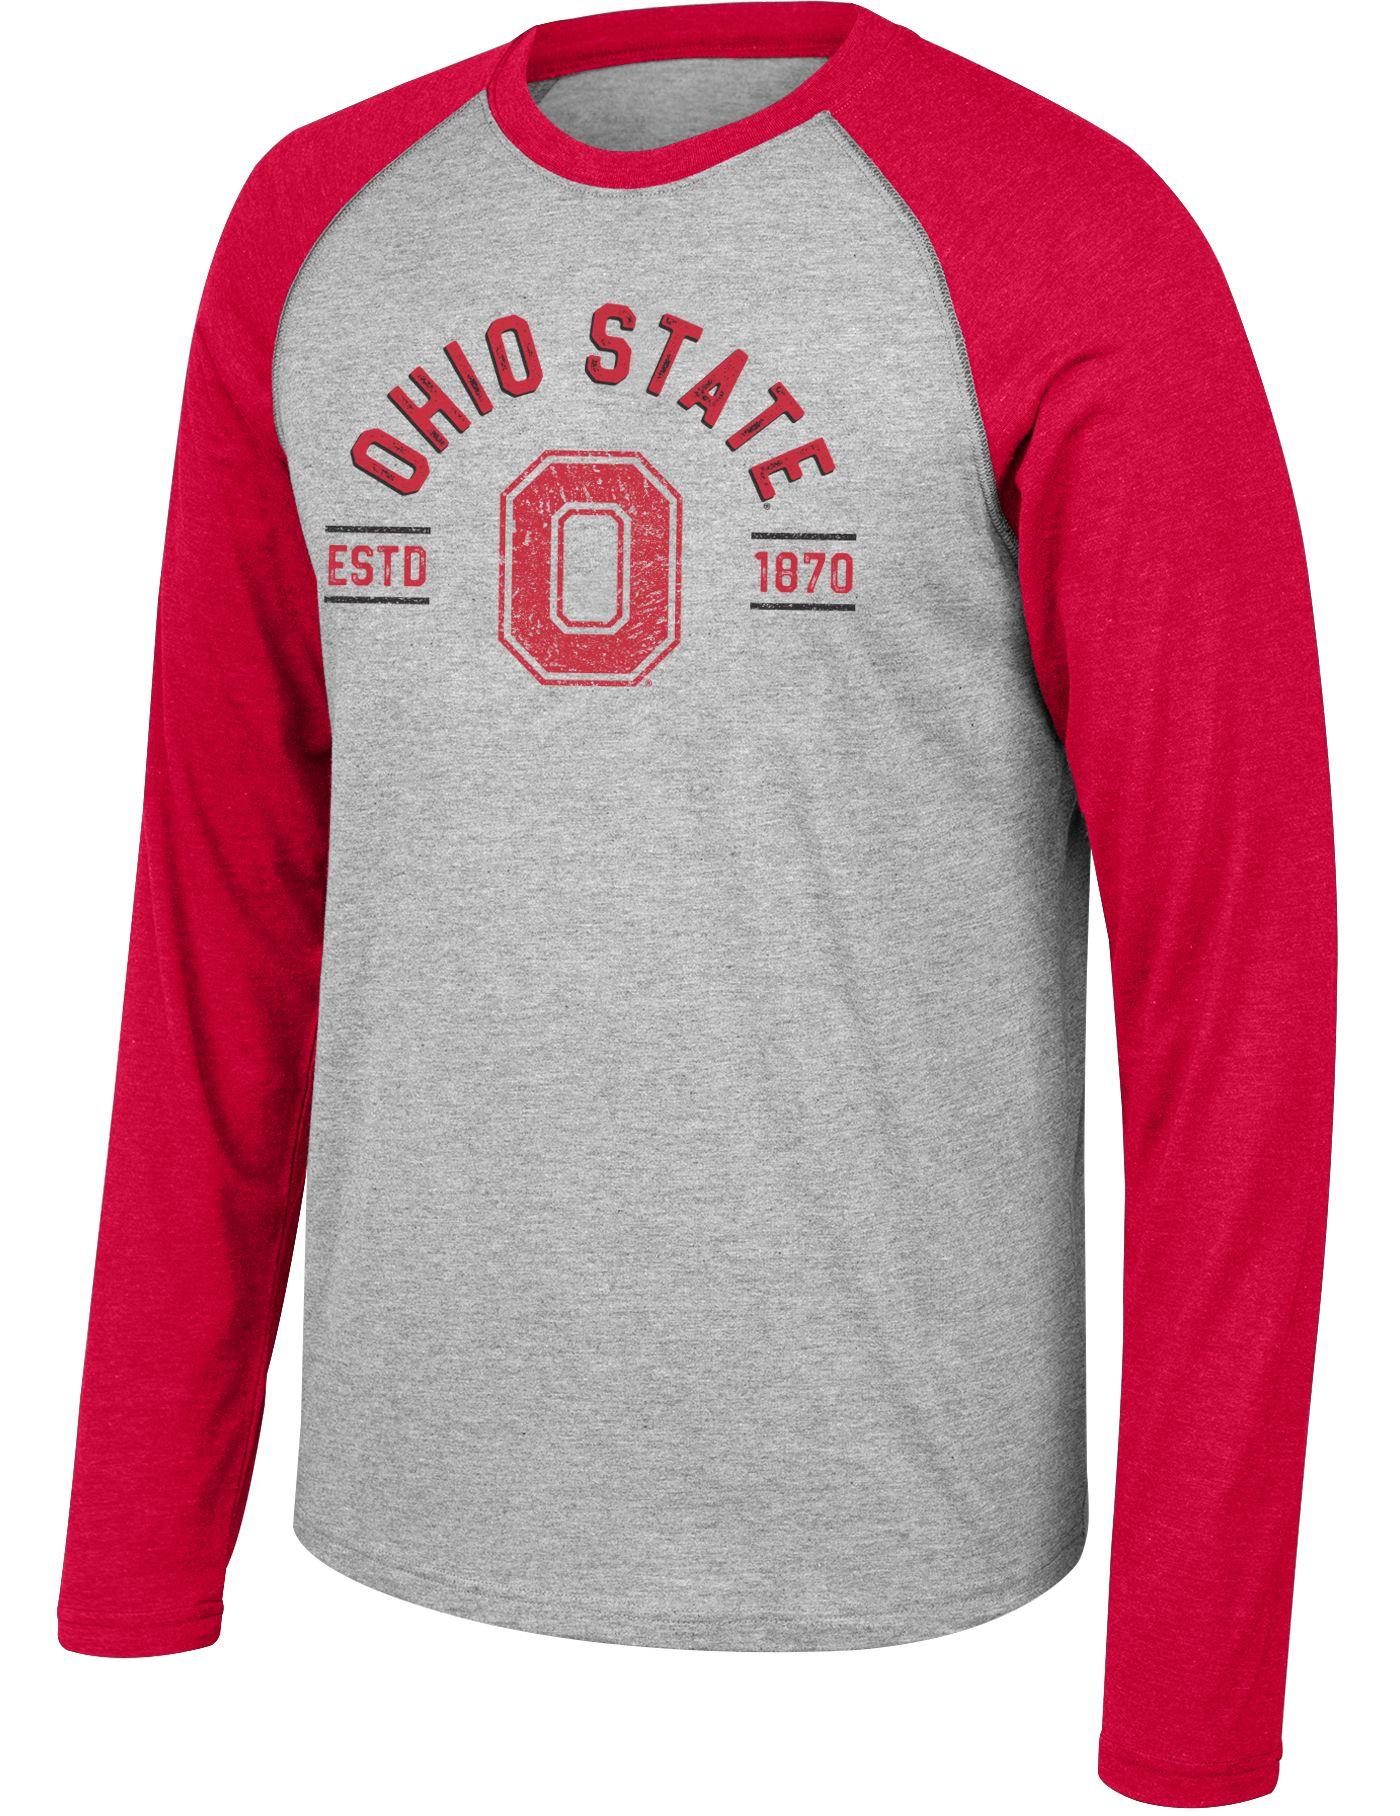 Scarlet & Gray Men's Ohio State Buckeyes Gray/Scarlet Heritage Raglan Long Sleeve T-Shirt